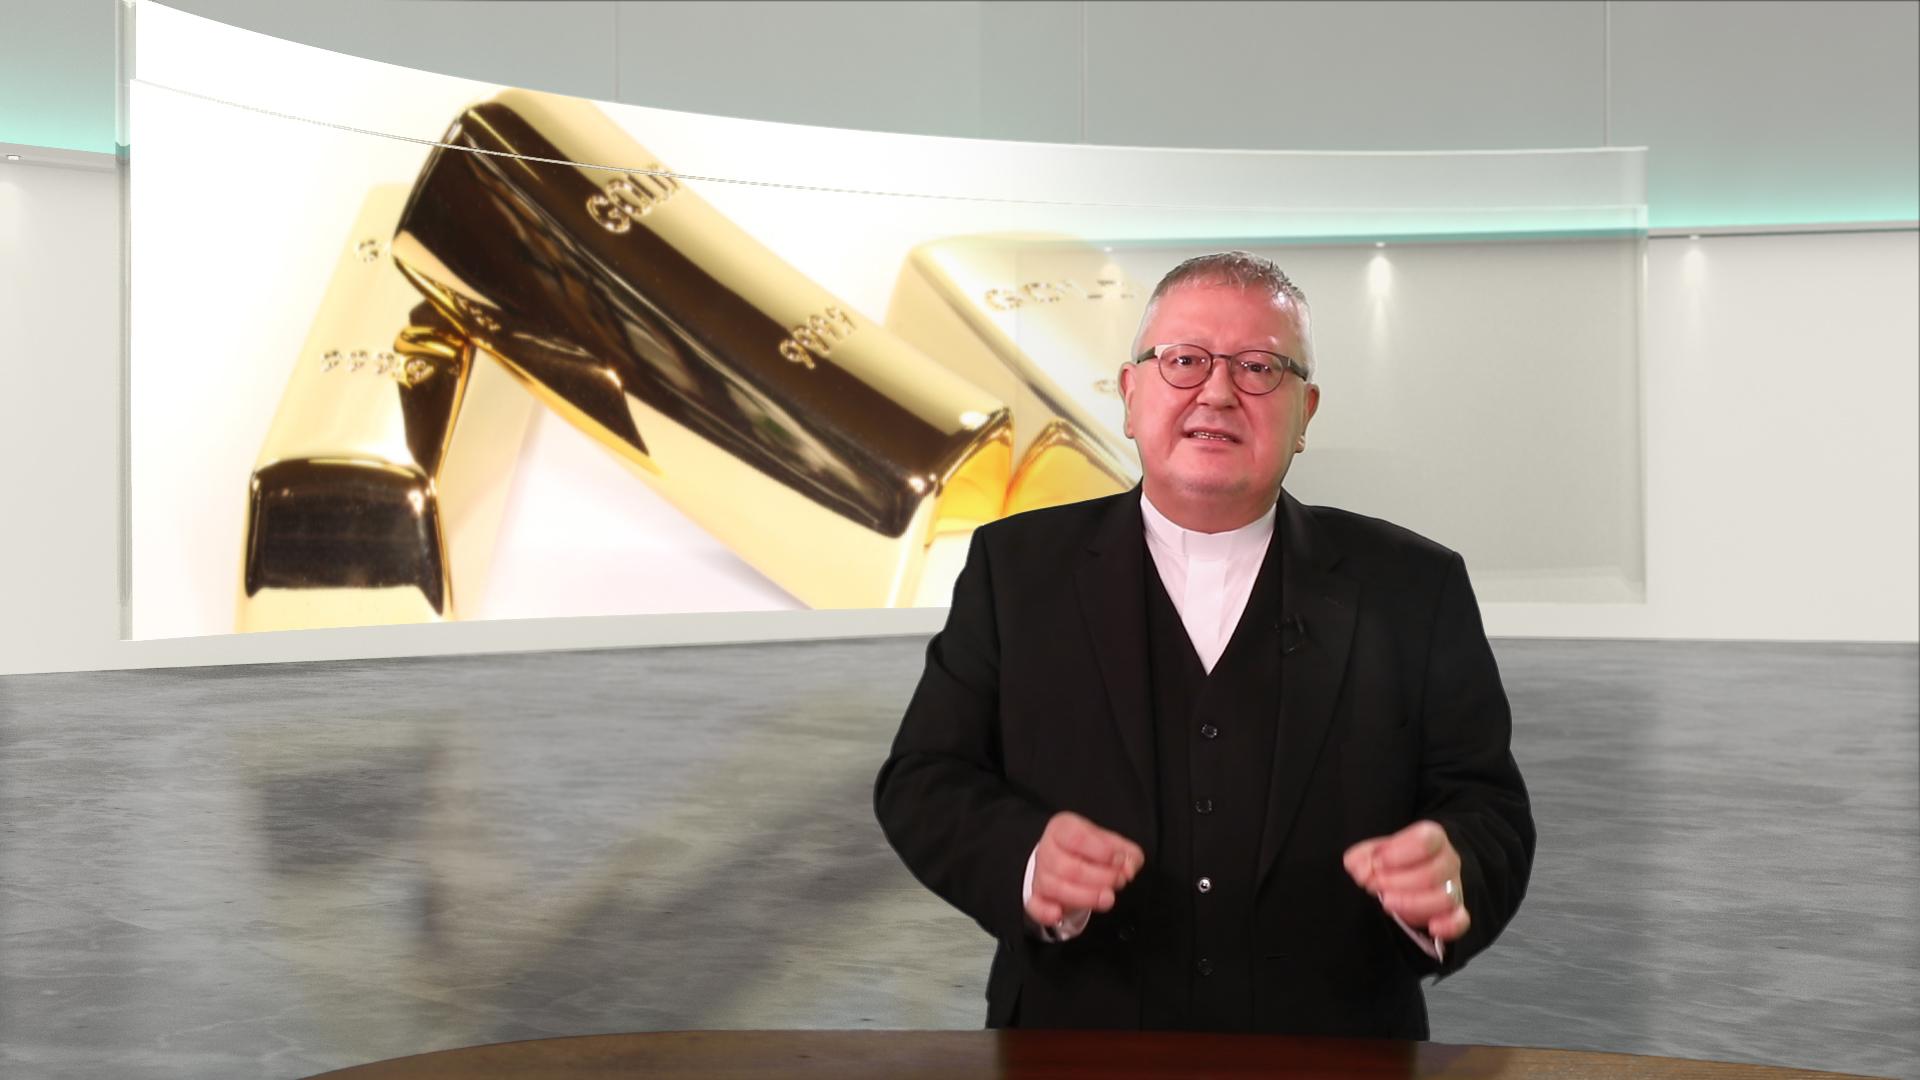 201115 Predigt Kirchgessner title2